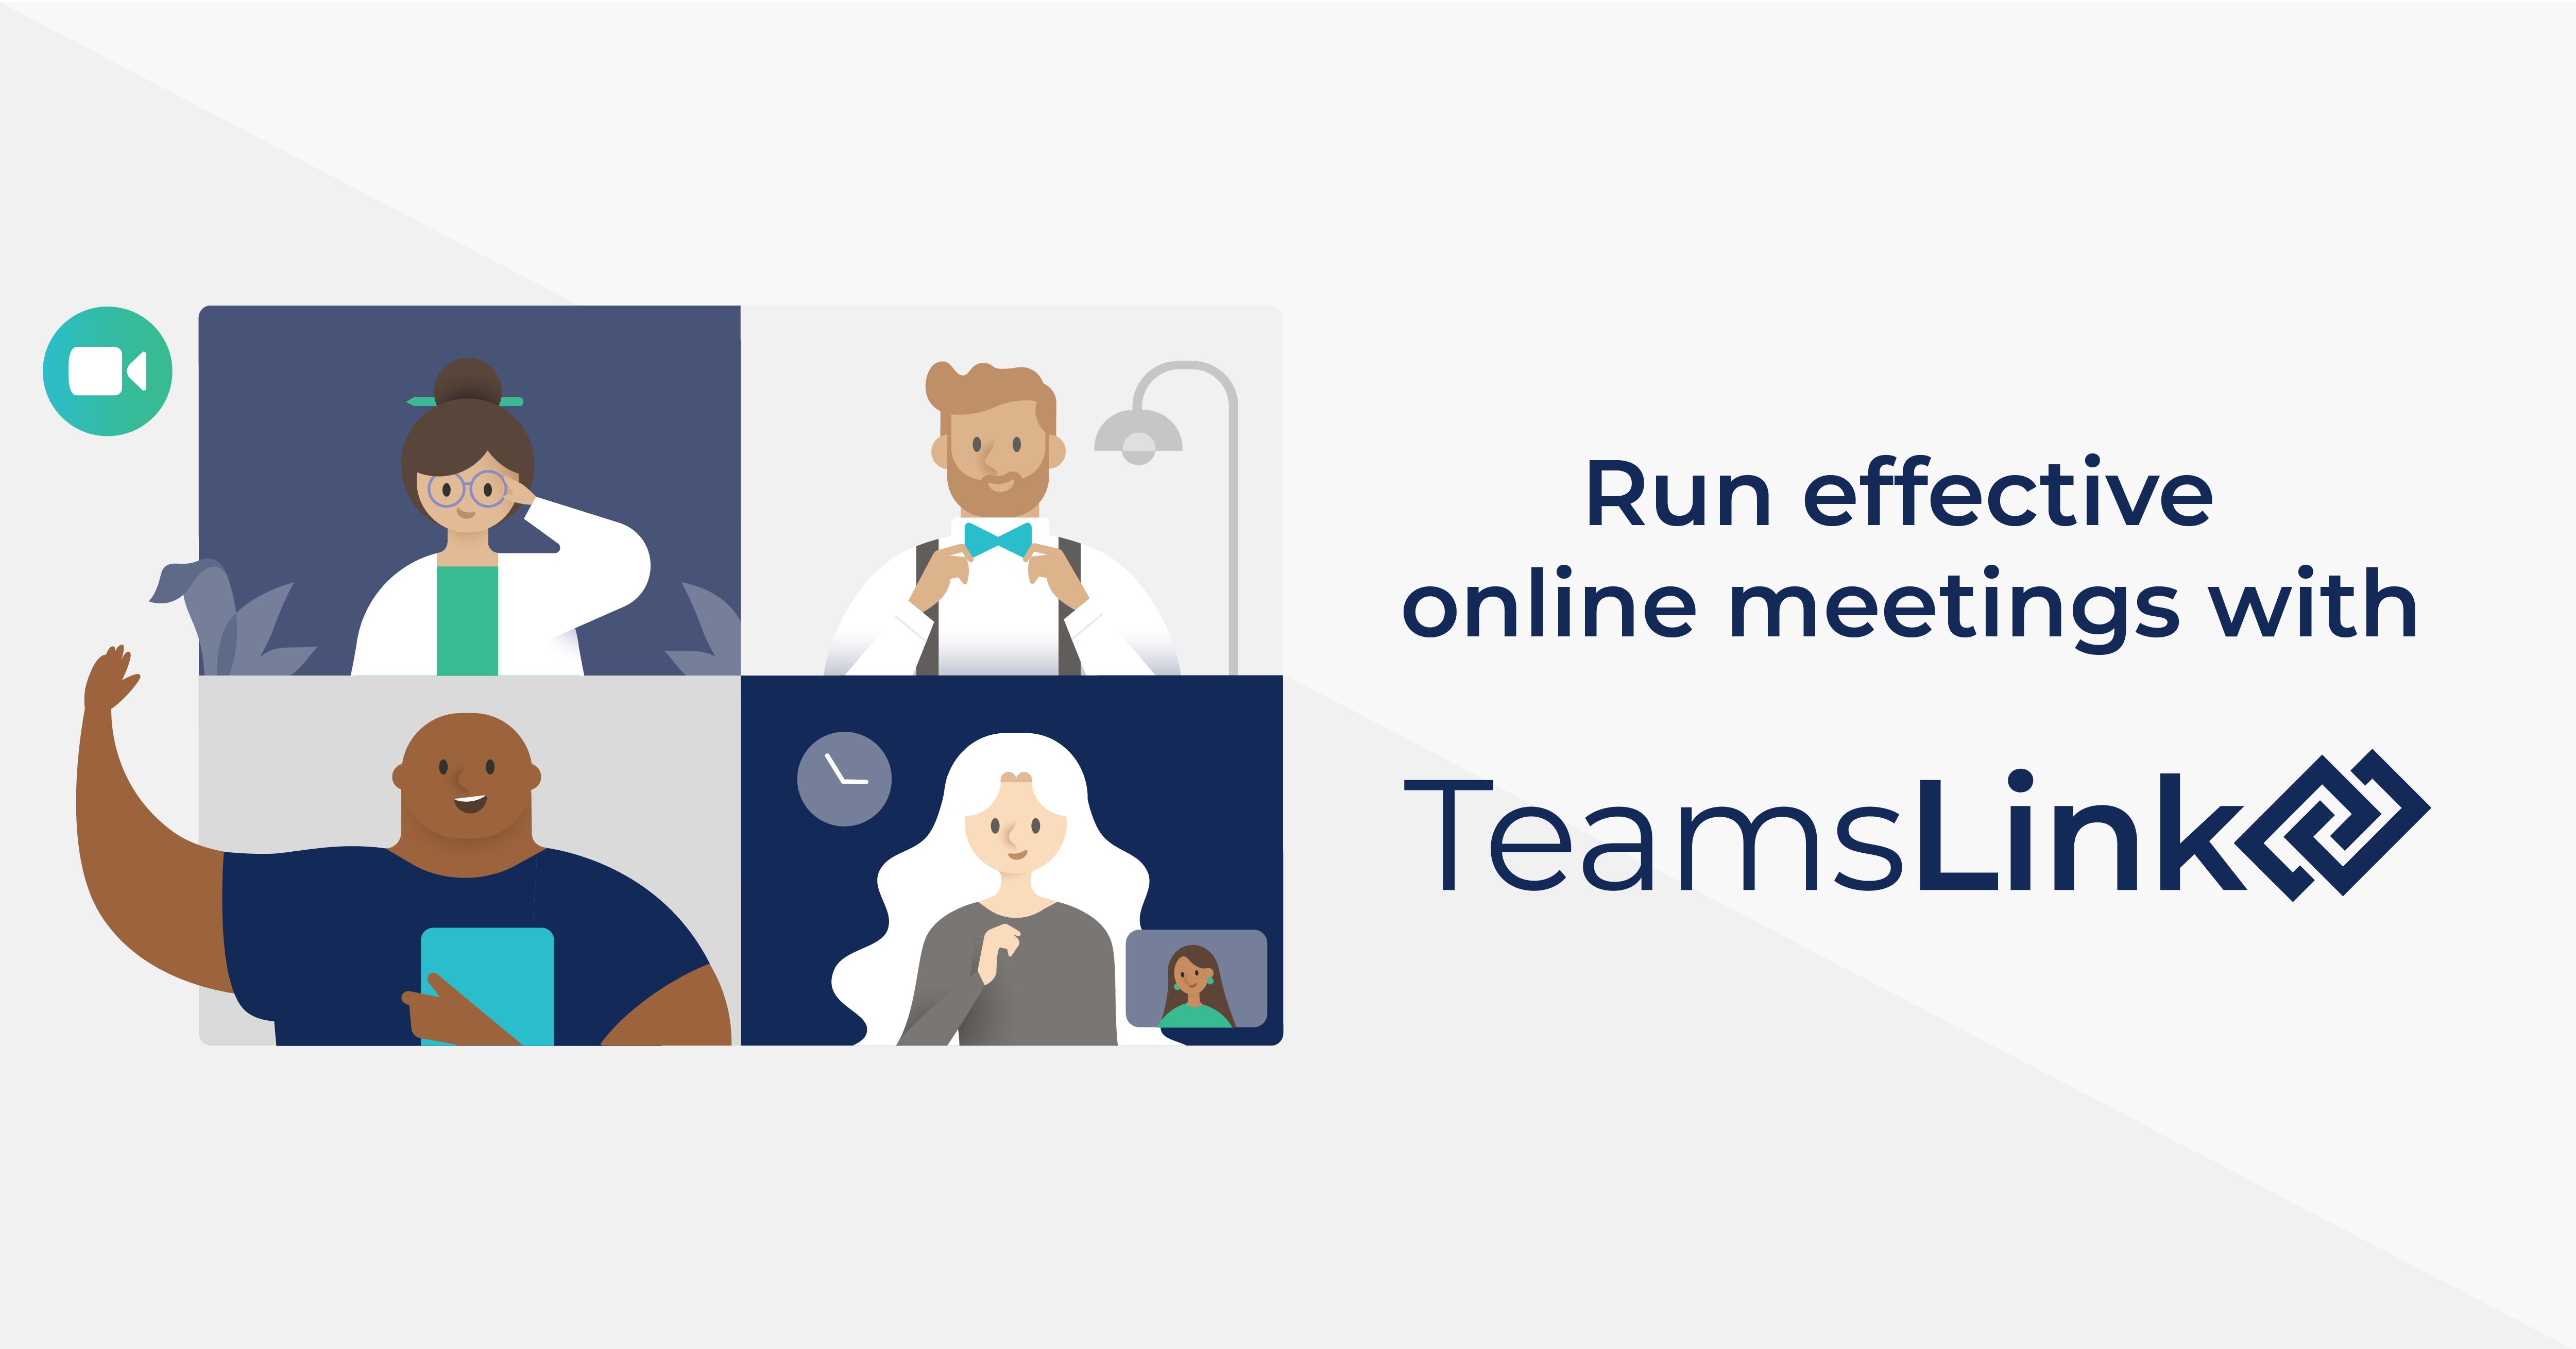 run effective online meetings social images-04